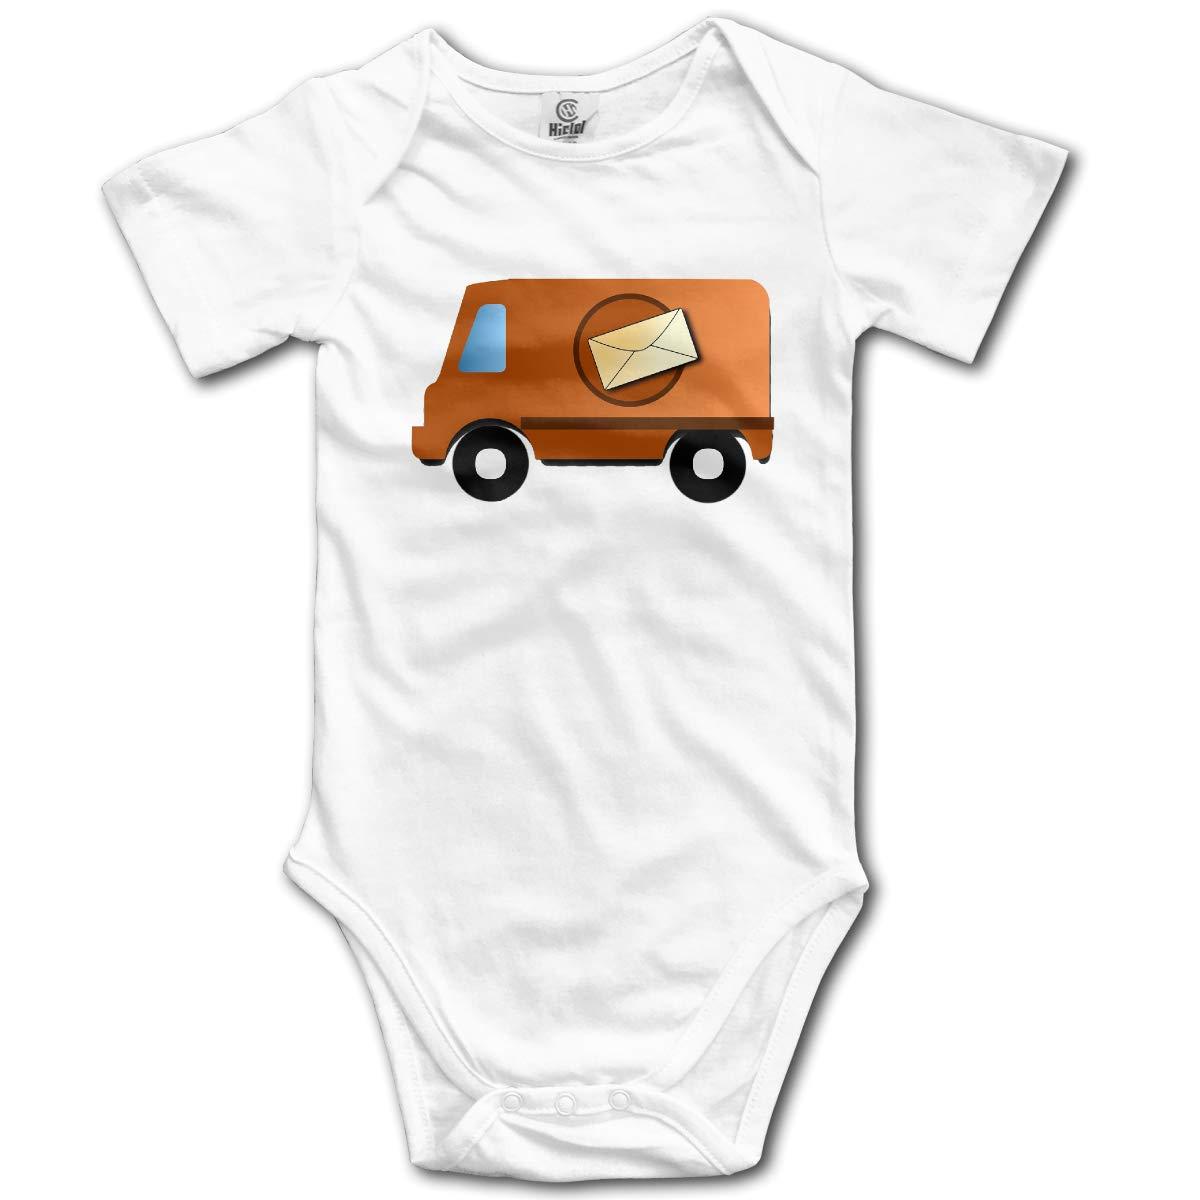 FAFU/&SKY Mail Truck Mailmanwps/å/›/¾/ç/‰/‡ Toddler Baby Romper Summer Short Sleeve Onesie